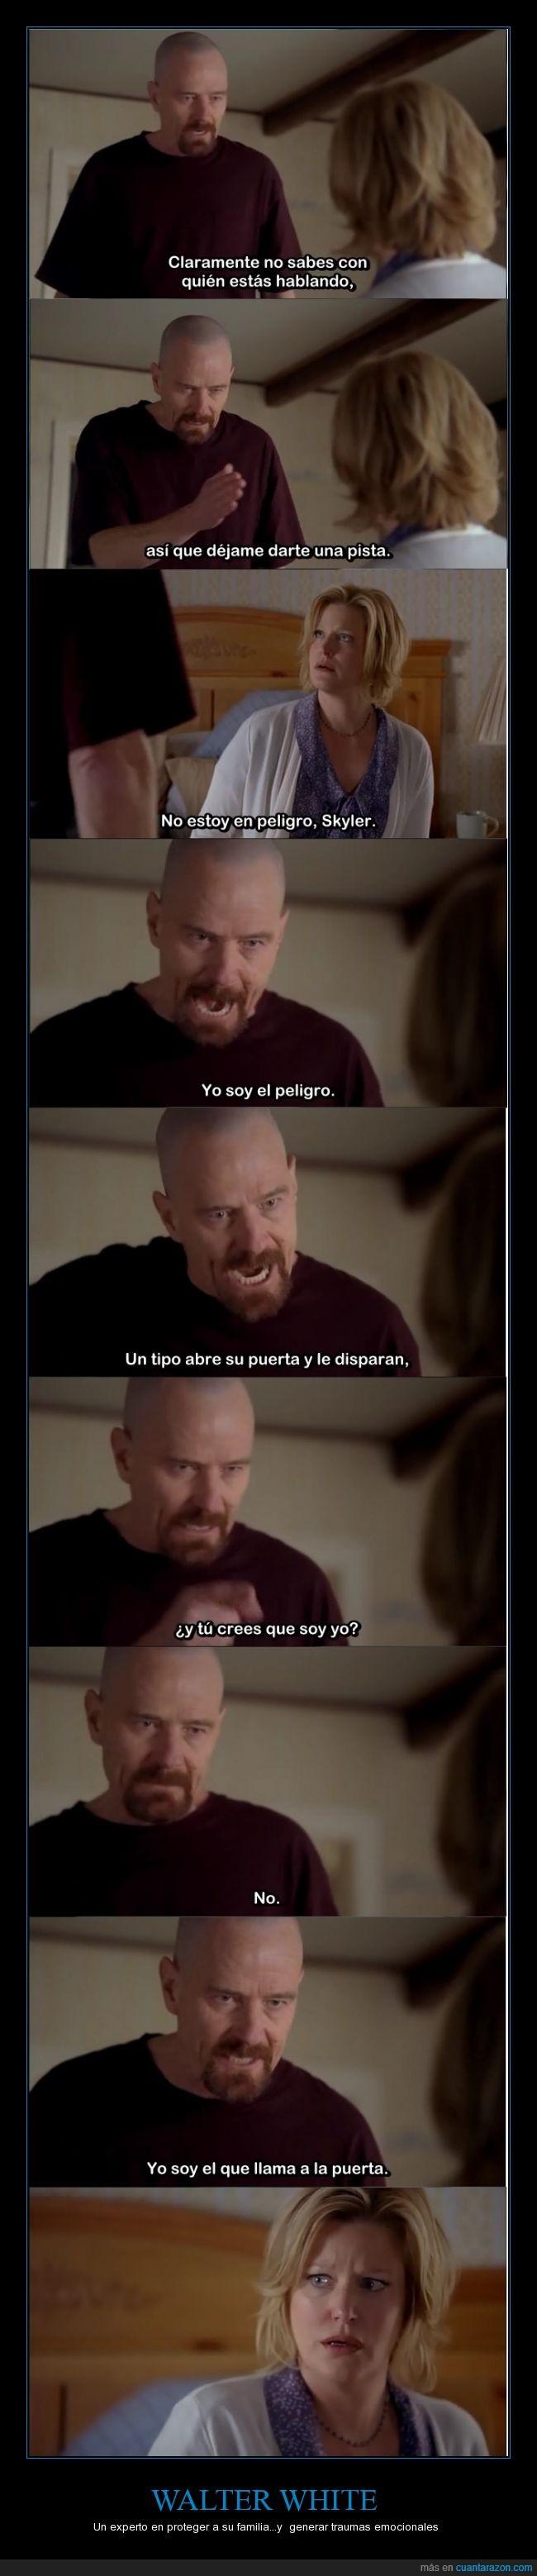 breaking bad,episodio,fragmento,llamar,peligro,proteger,puerta,Skyler,Walt